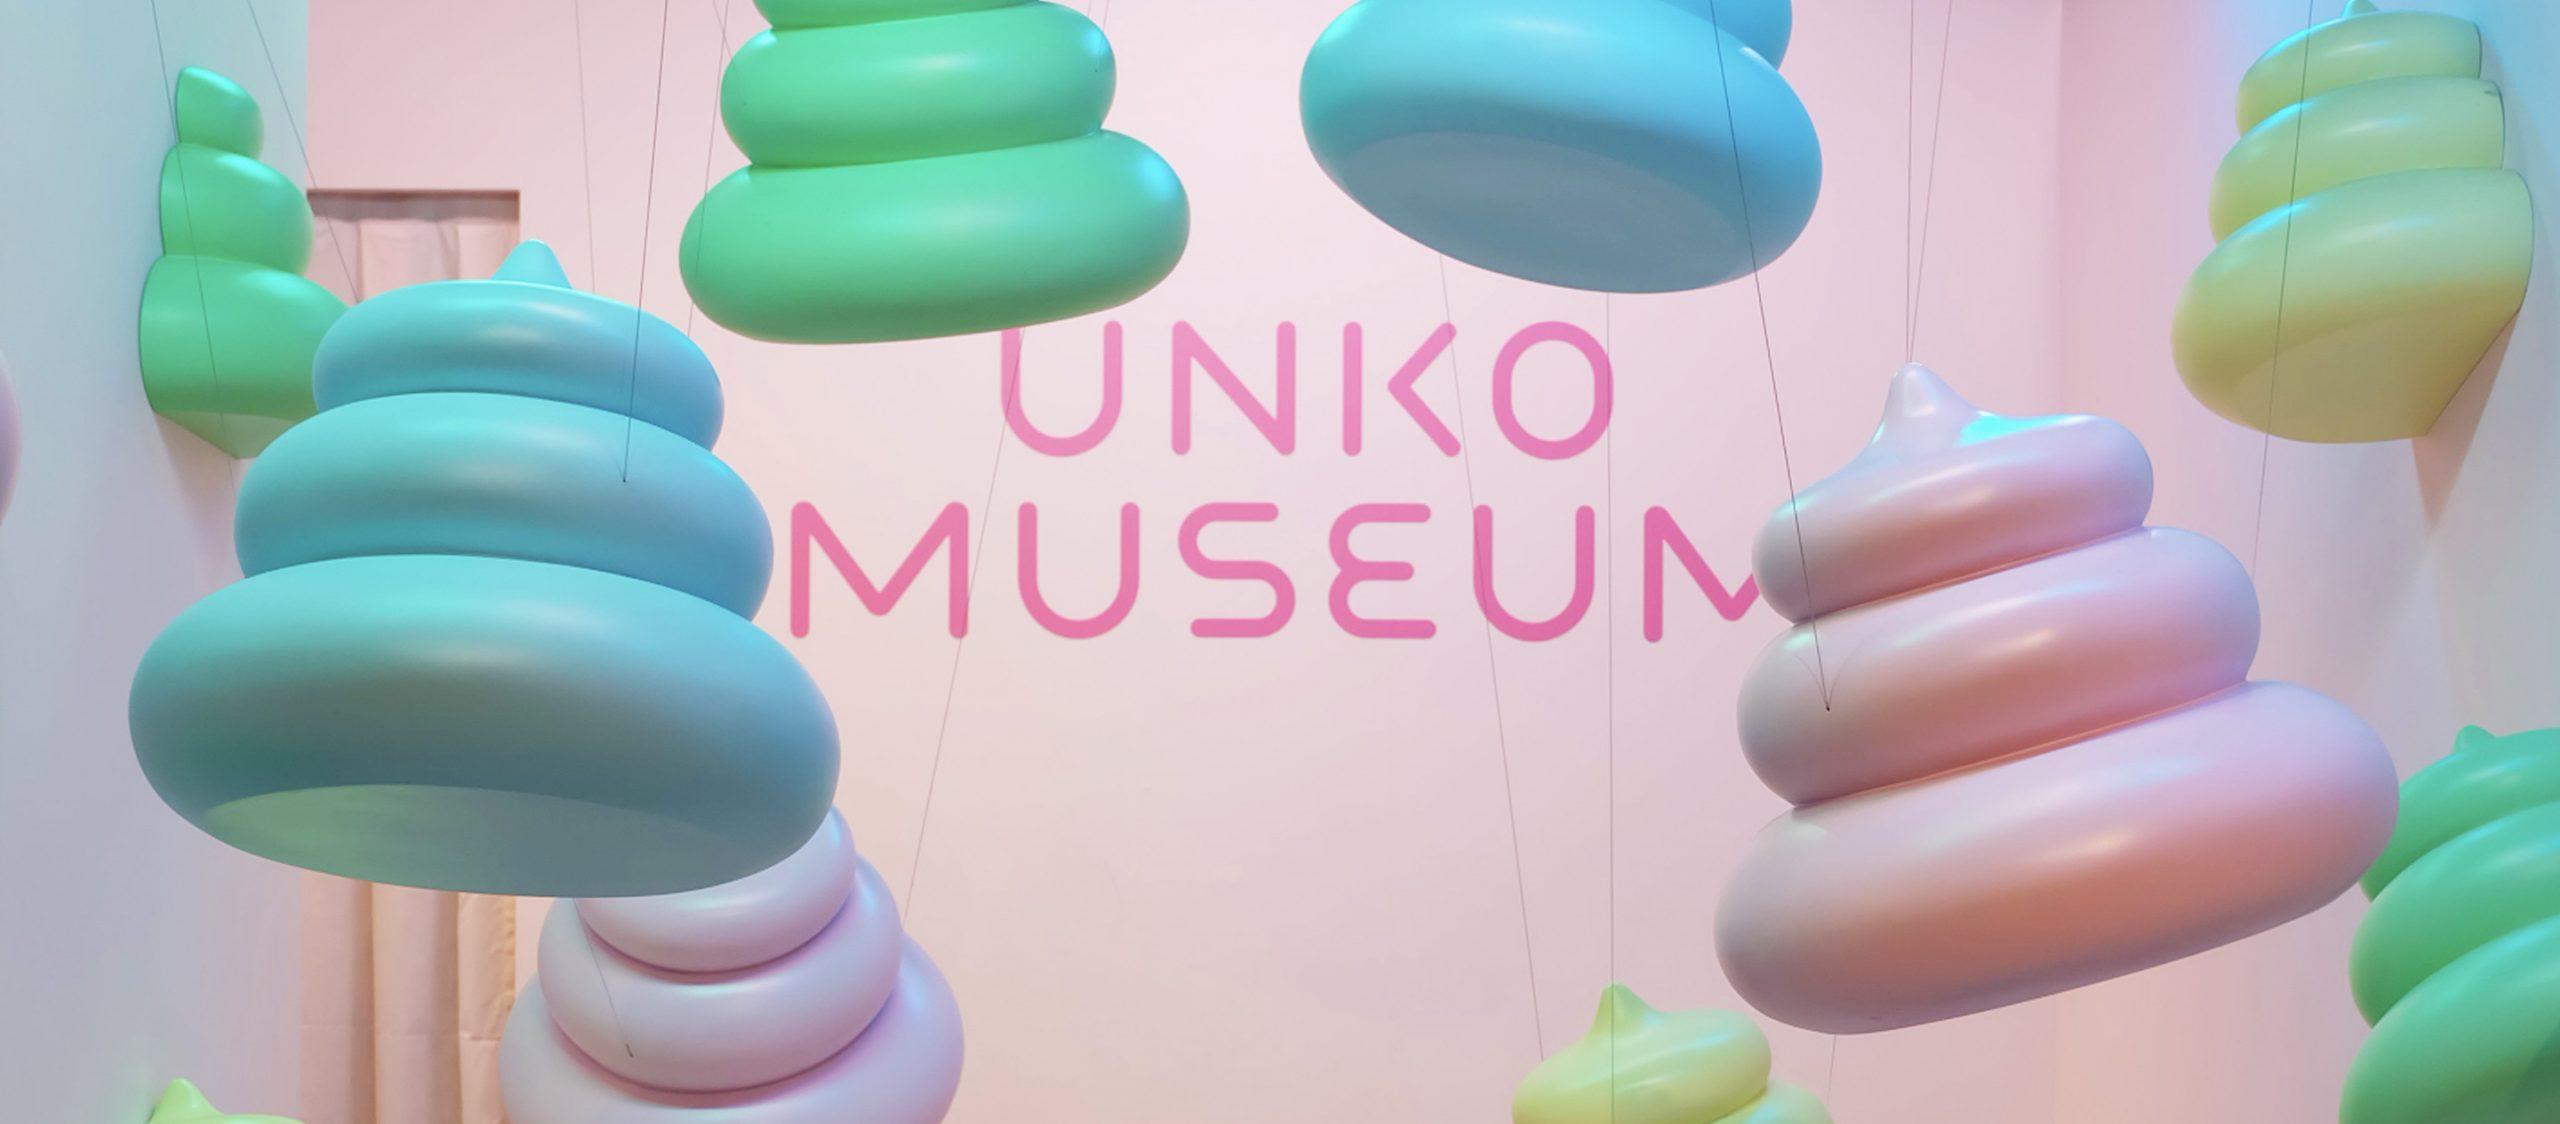 Unko Museum ปฏิบัติการปลดปล่อยอุนโกะออกจากค่านิยมที่ถูกปิดตายด้วยความสนุกสดใสของเด็กสาว